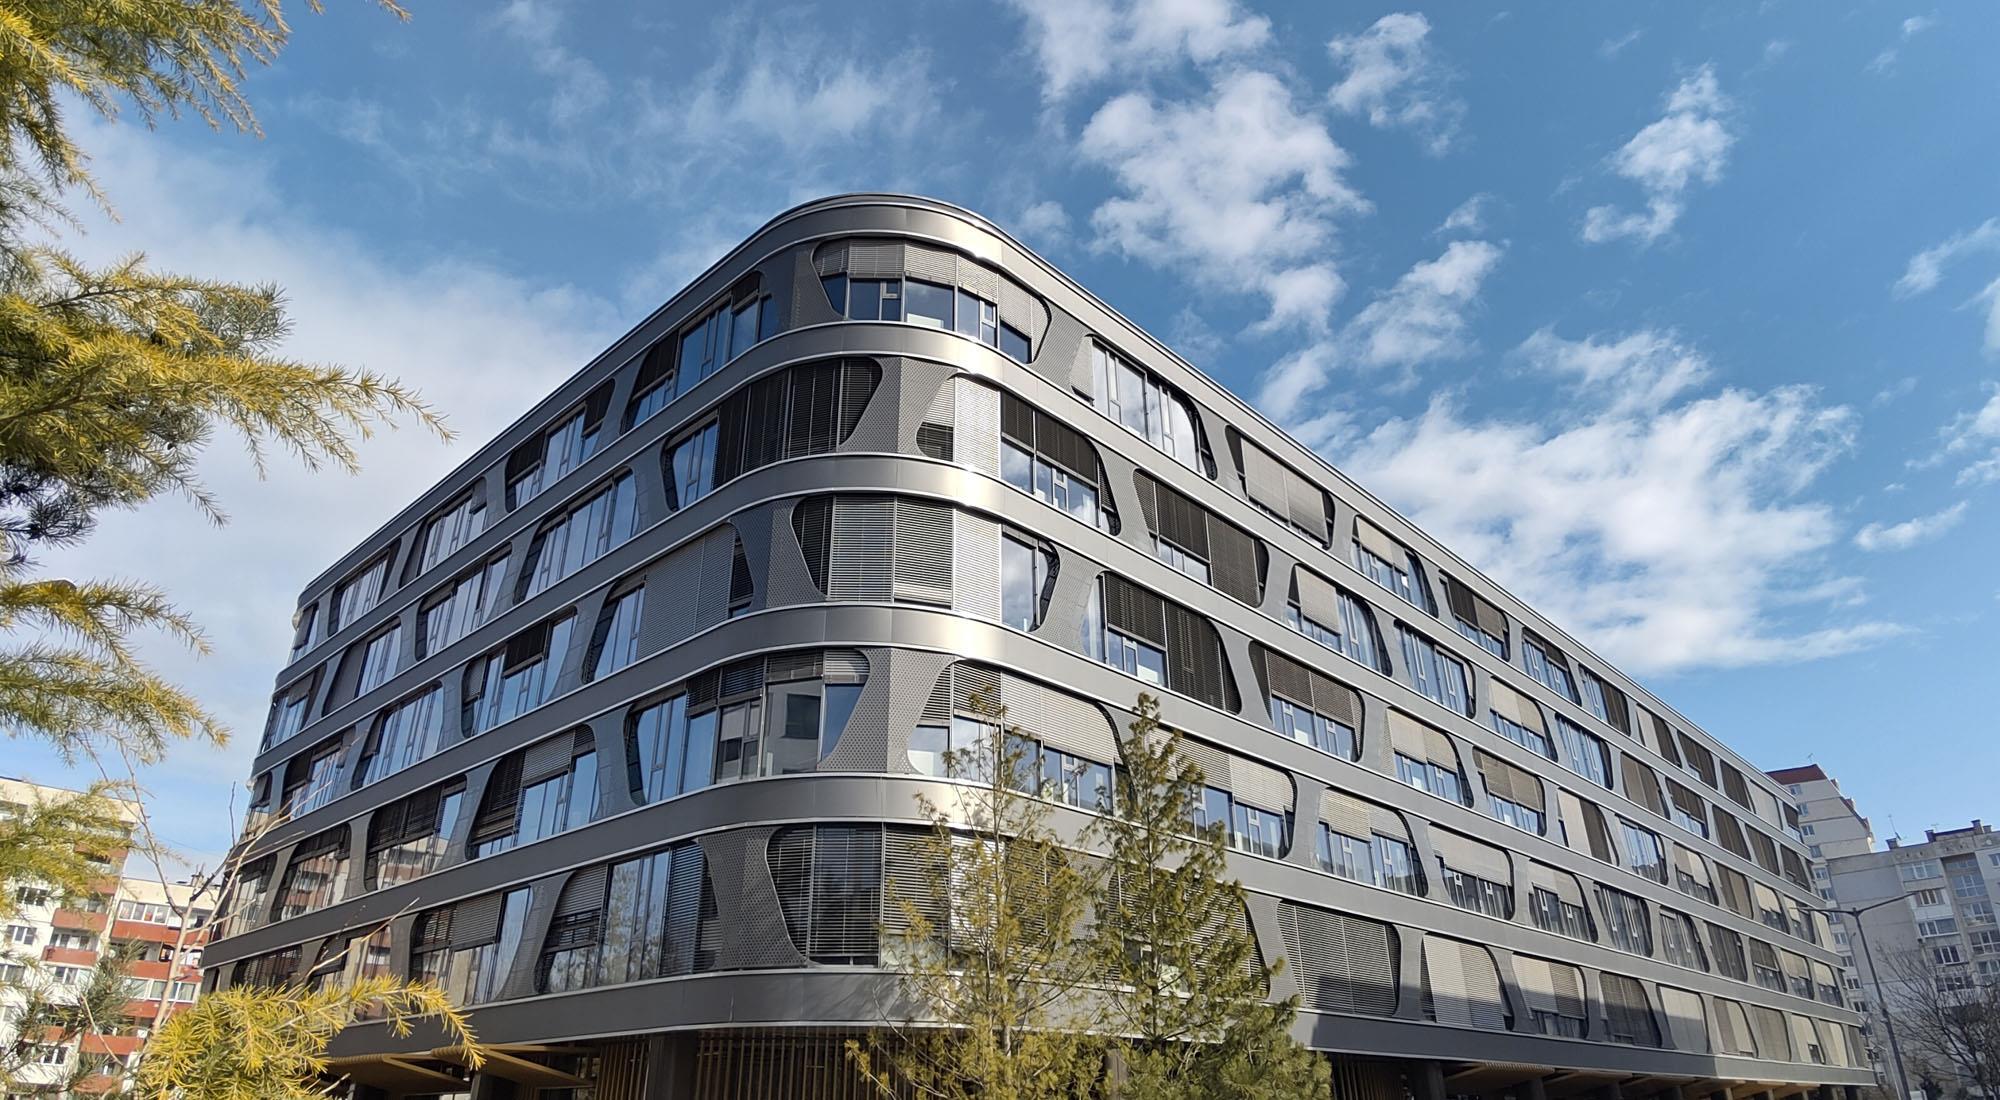 https://alukoenigstahl.mk/wp-content/uploads/2020/09/Building-15-1.jpg